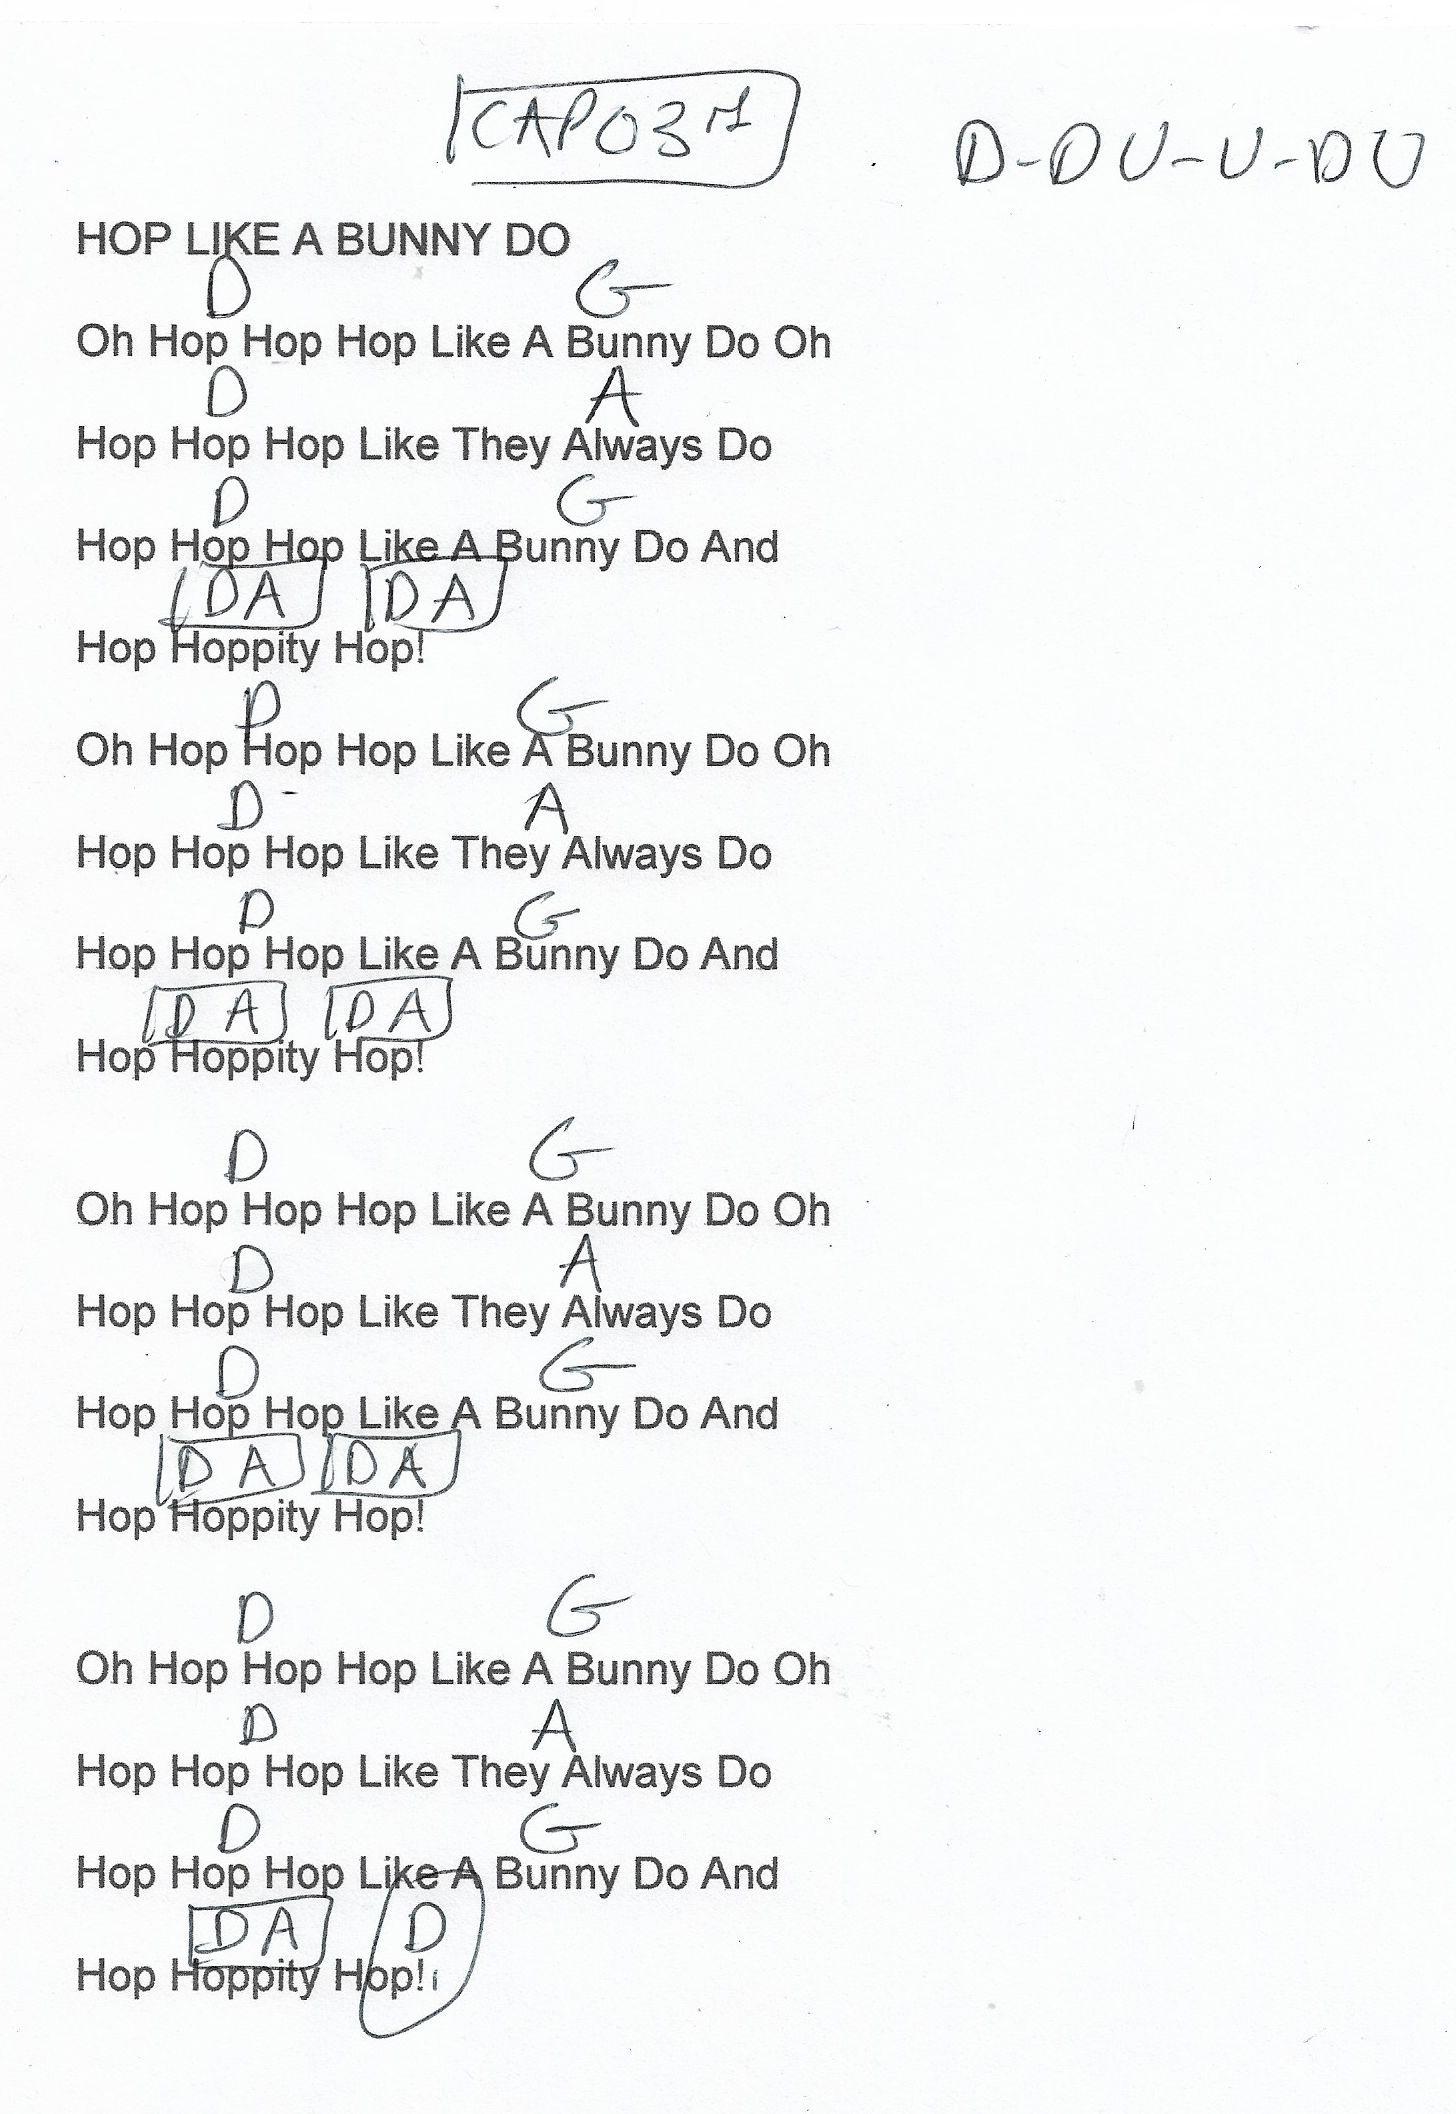 Hop Like The Bunny Do Internet Guitar Chord Chart Capo 3rd Fret Chord Chart Guitar Chord Chart Guitar Lessons